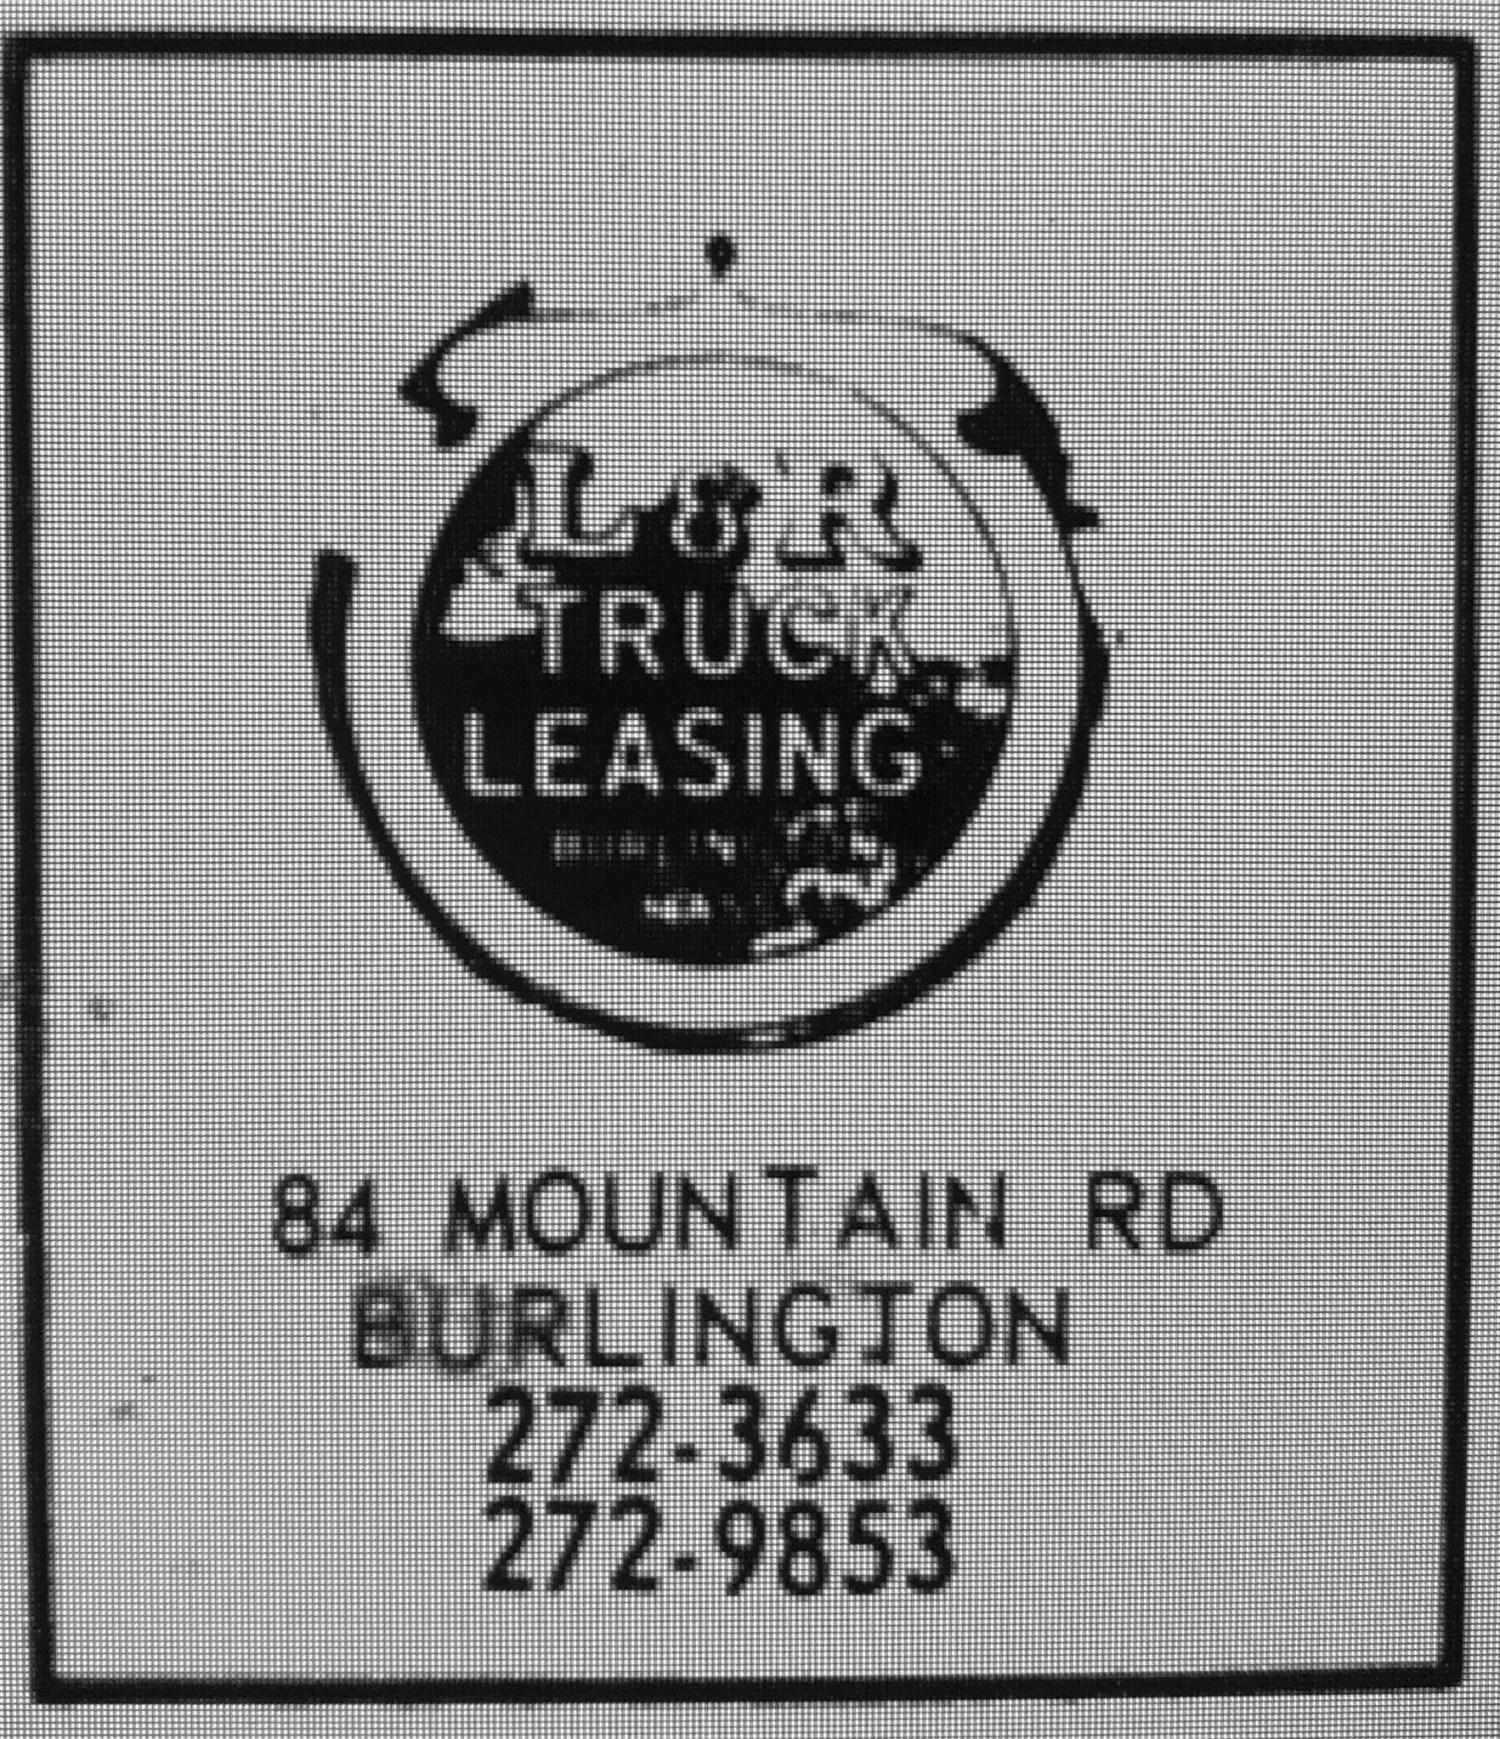 L&R Truck Leasing 84 Mountain Road Burlington MA